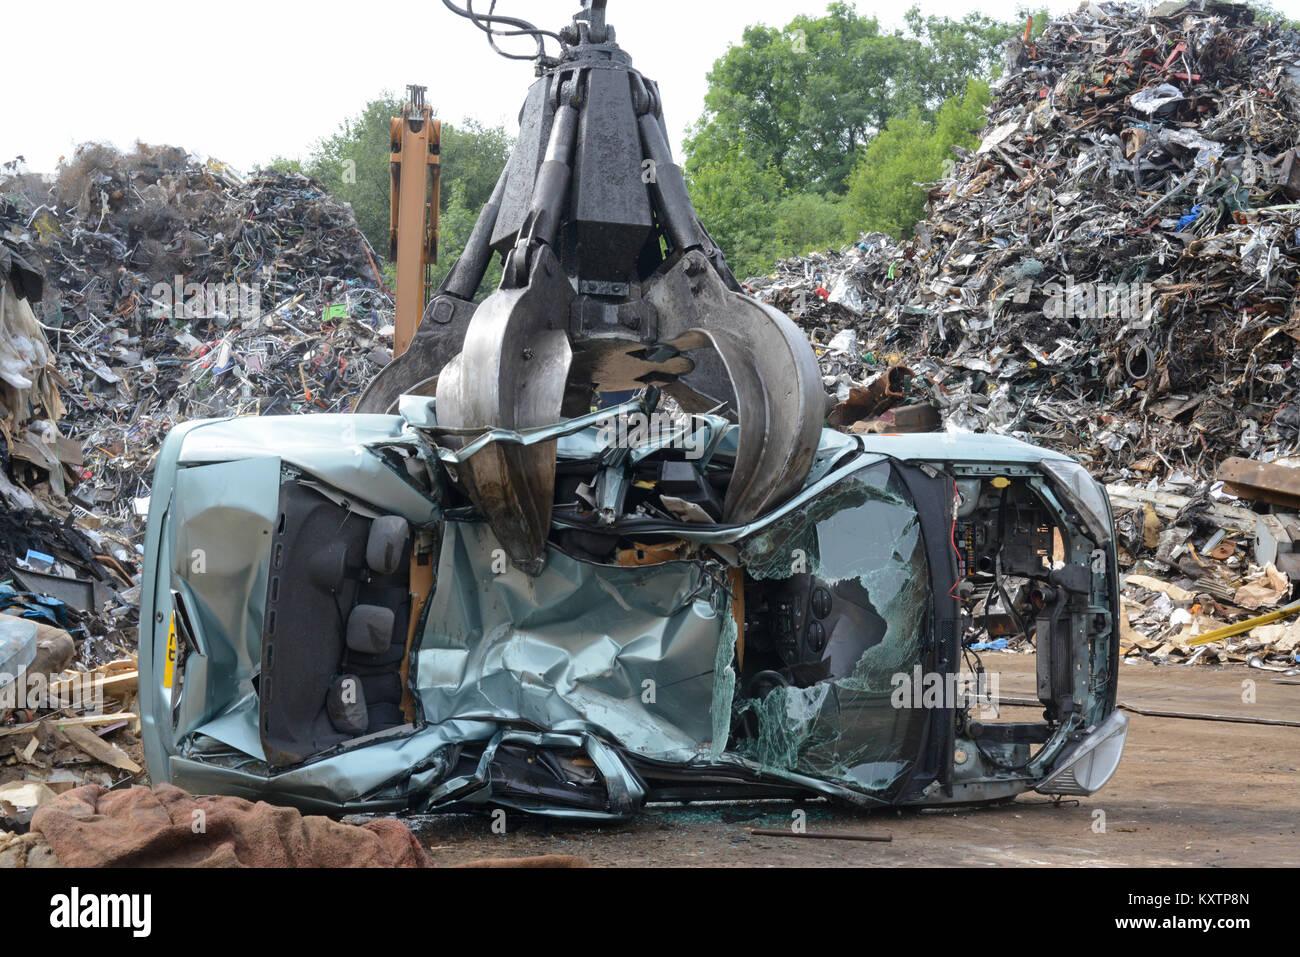 giant claws of grab arm crushing car at scrapyard leeds yorkshire united kingdom - Stock Image